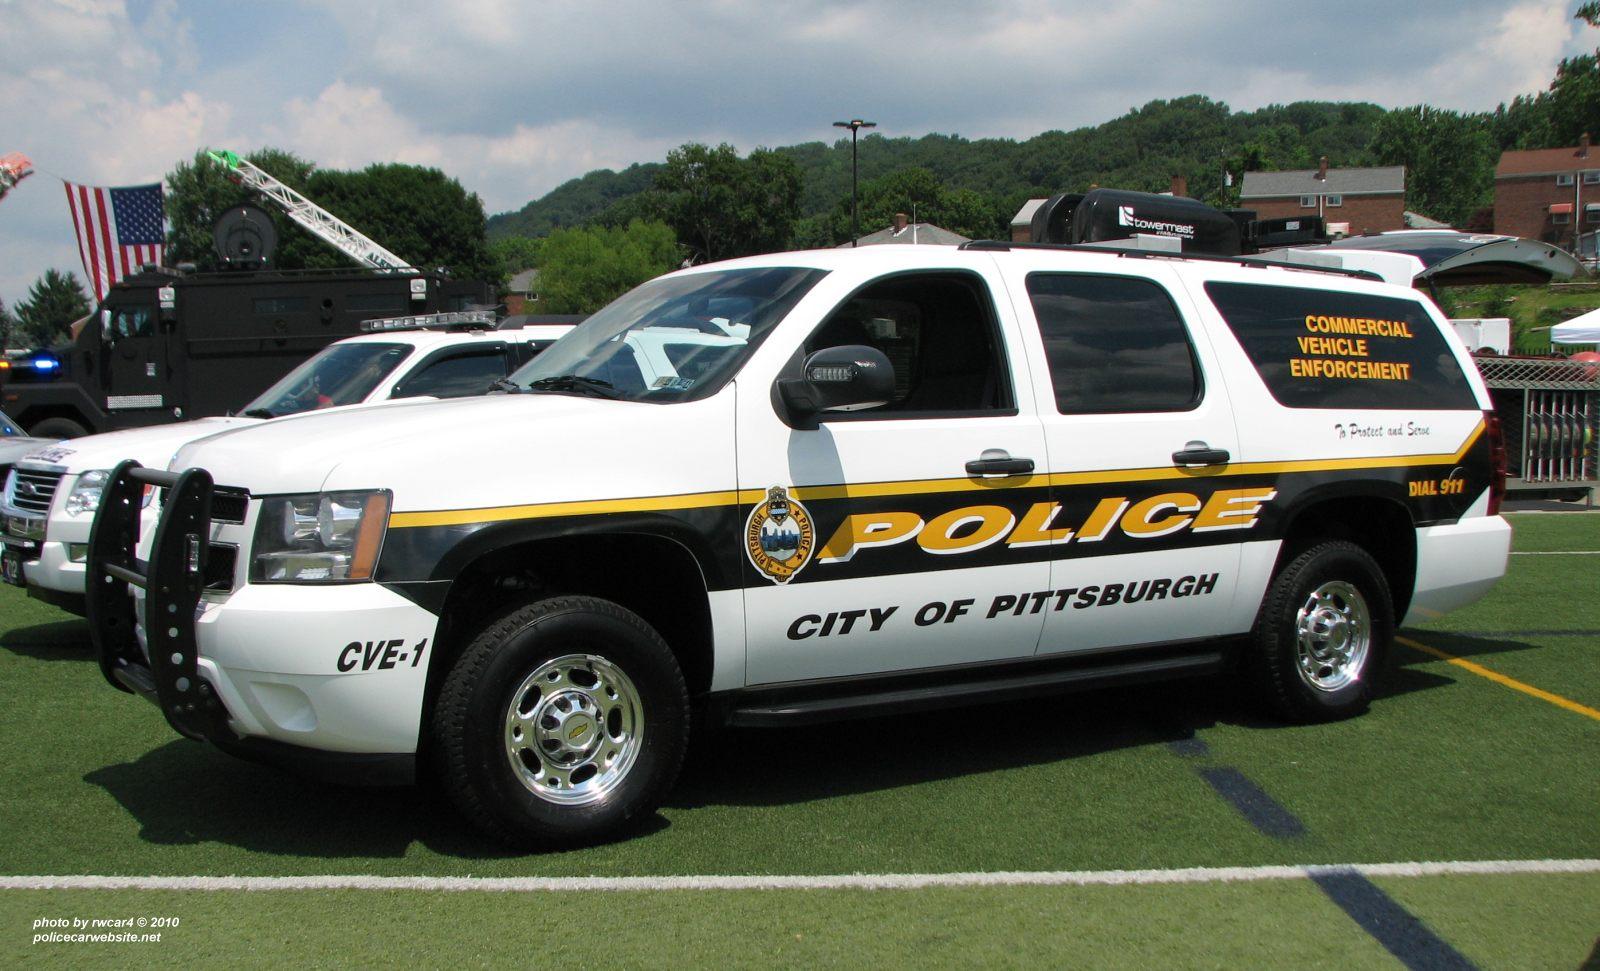 Police Car Website >> Police Car Website